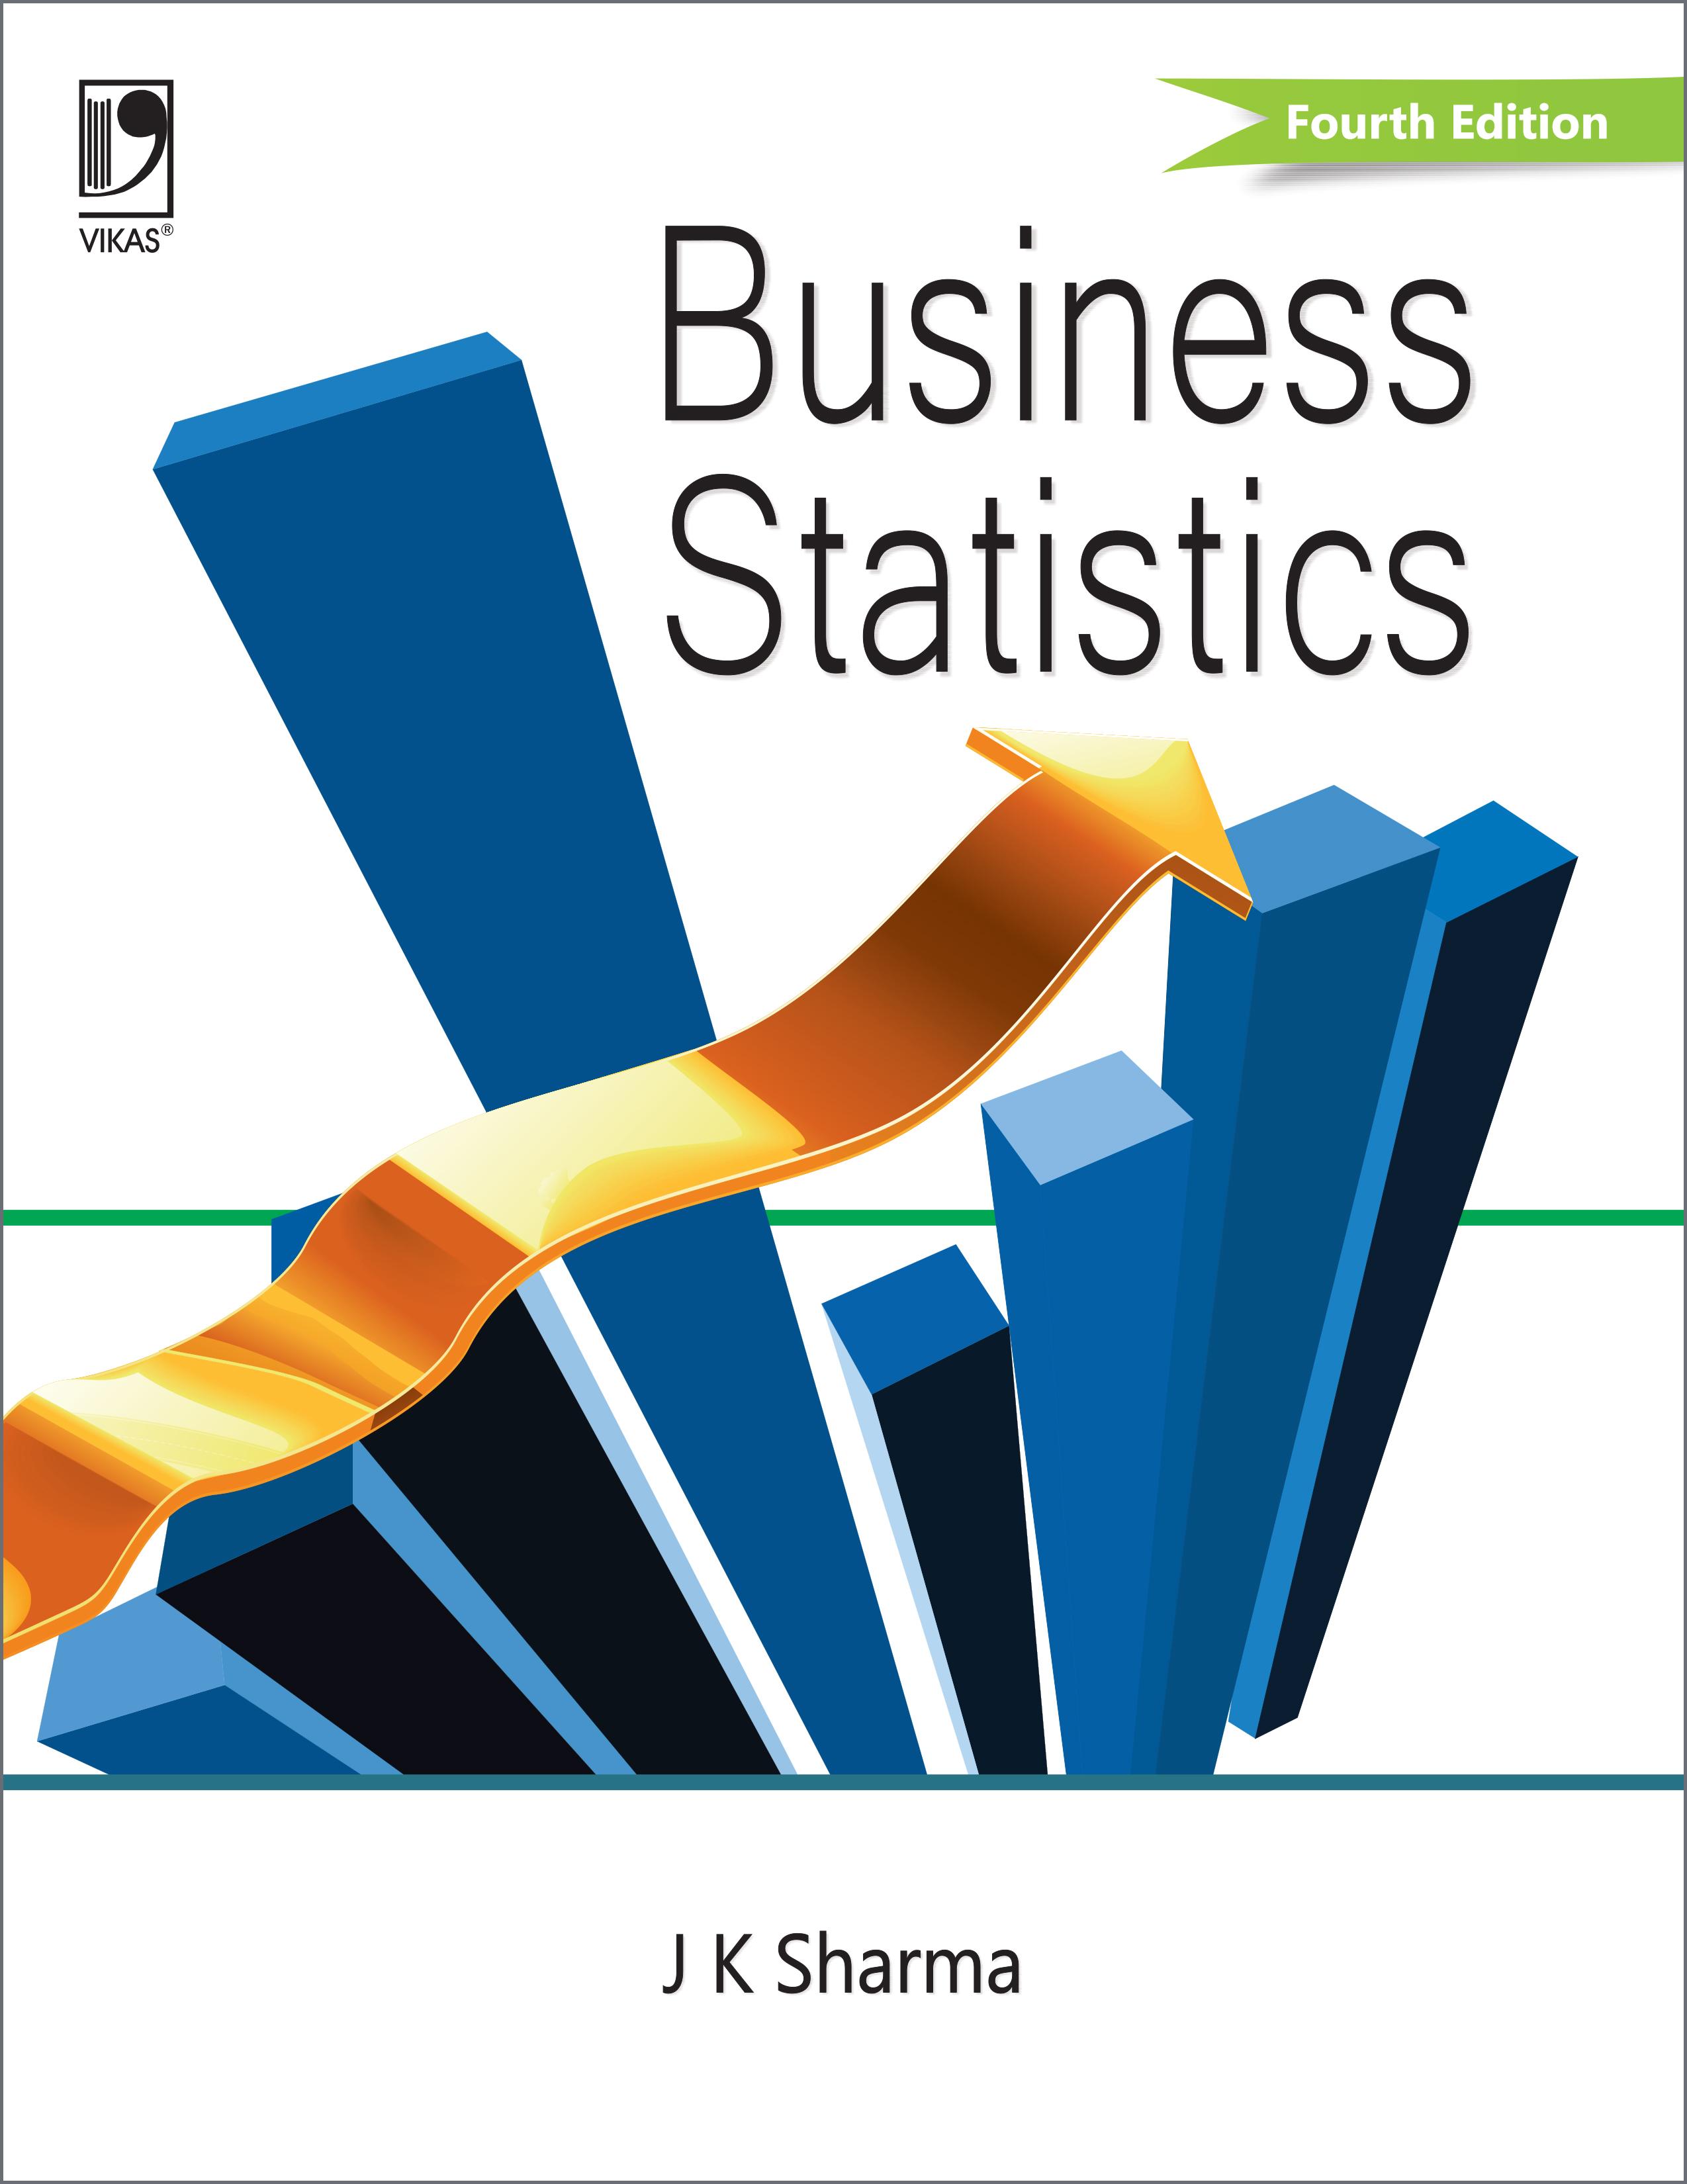 Business Statistics by  J K Sharma